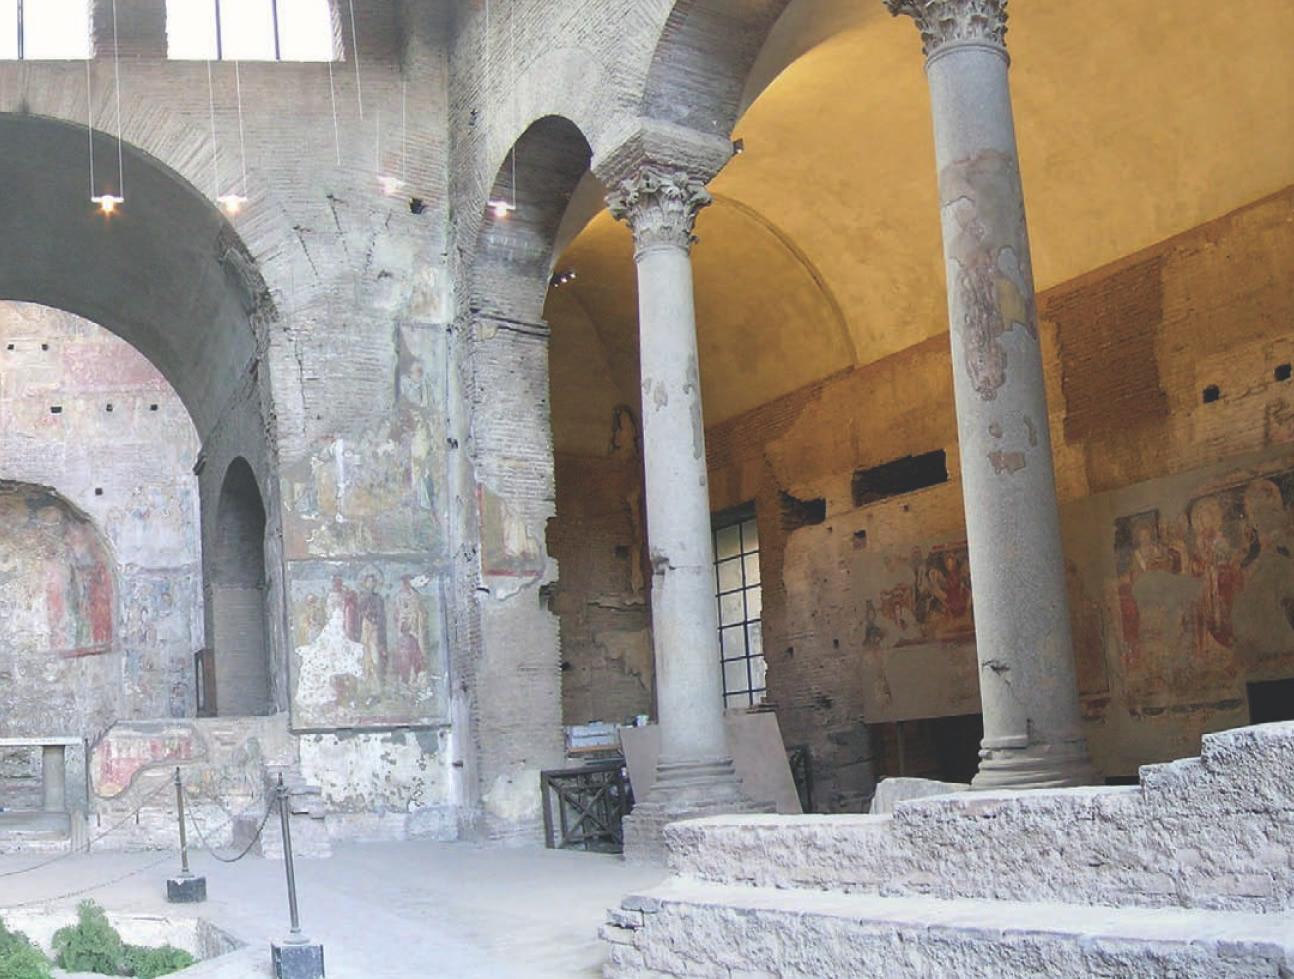 (The other is Santi Cosma e Damiano, built a few decades before Santa Maria.